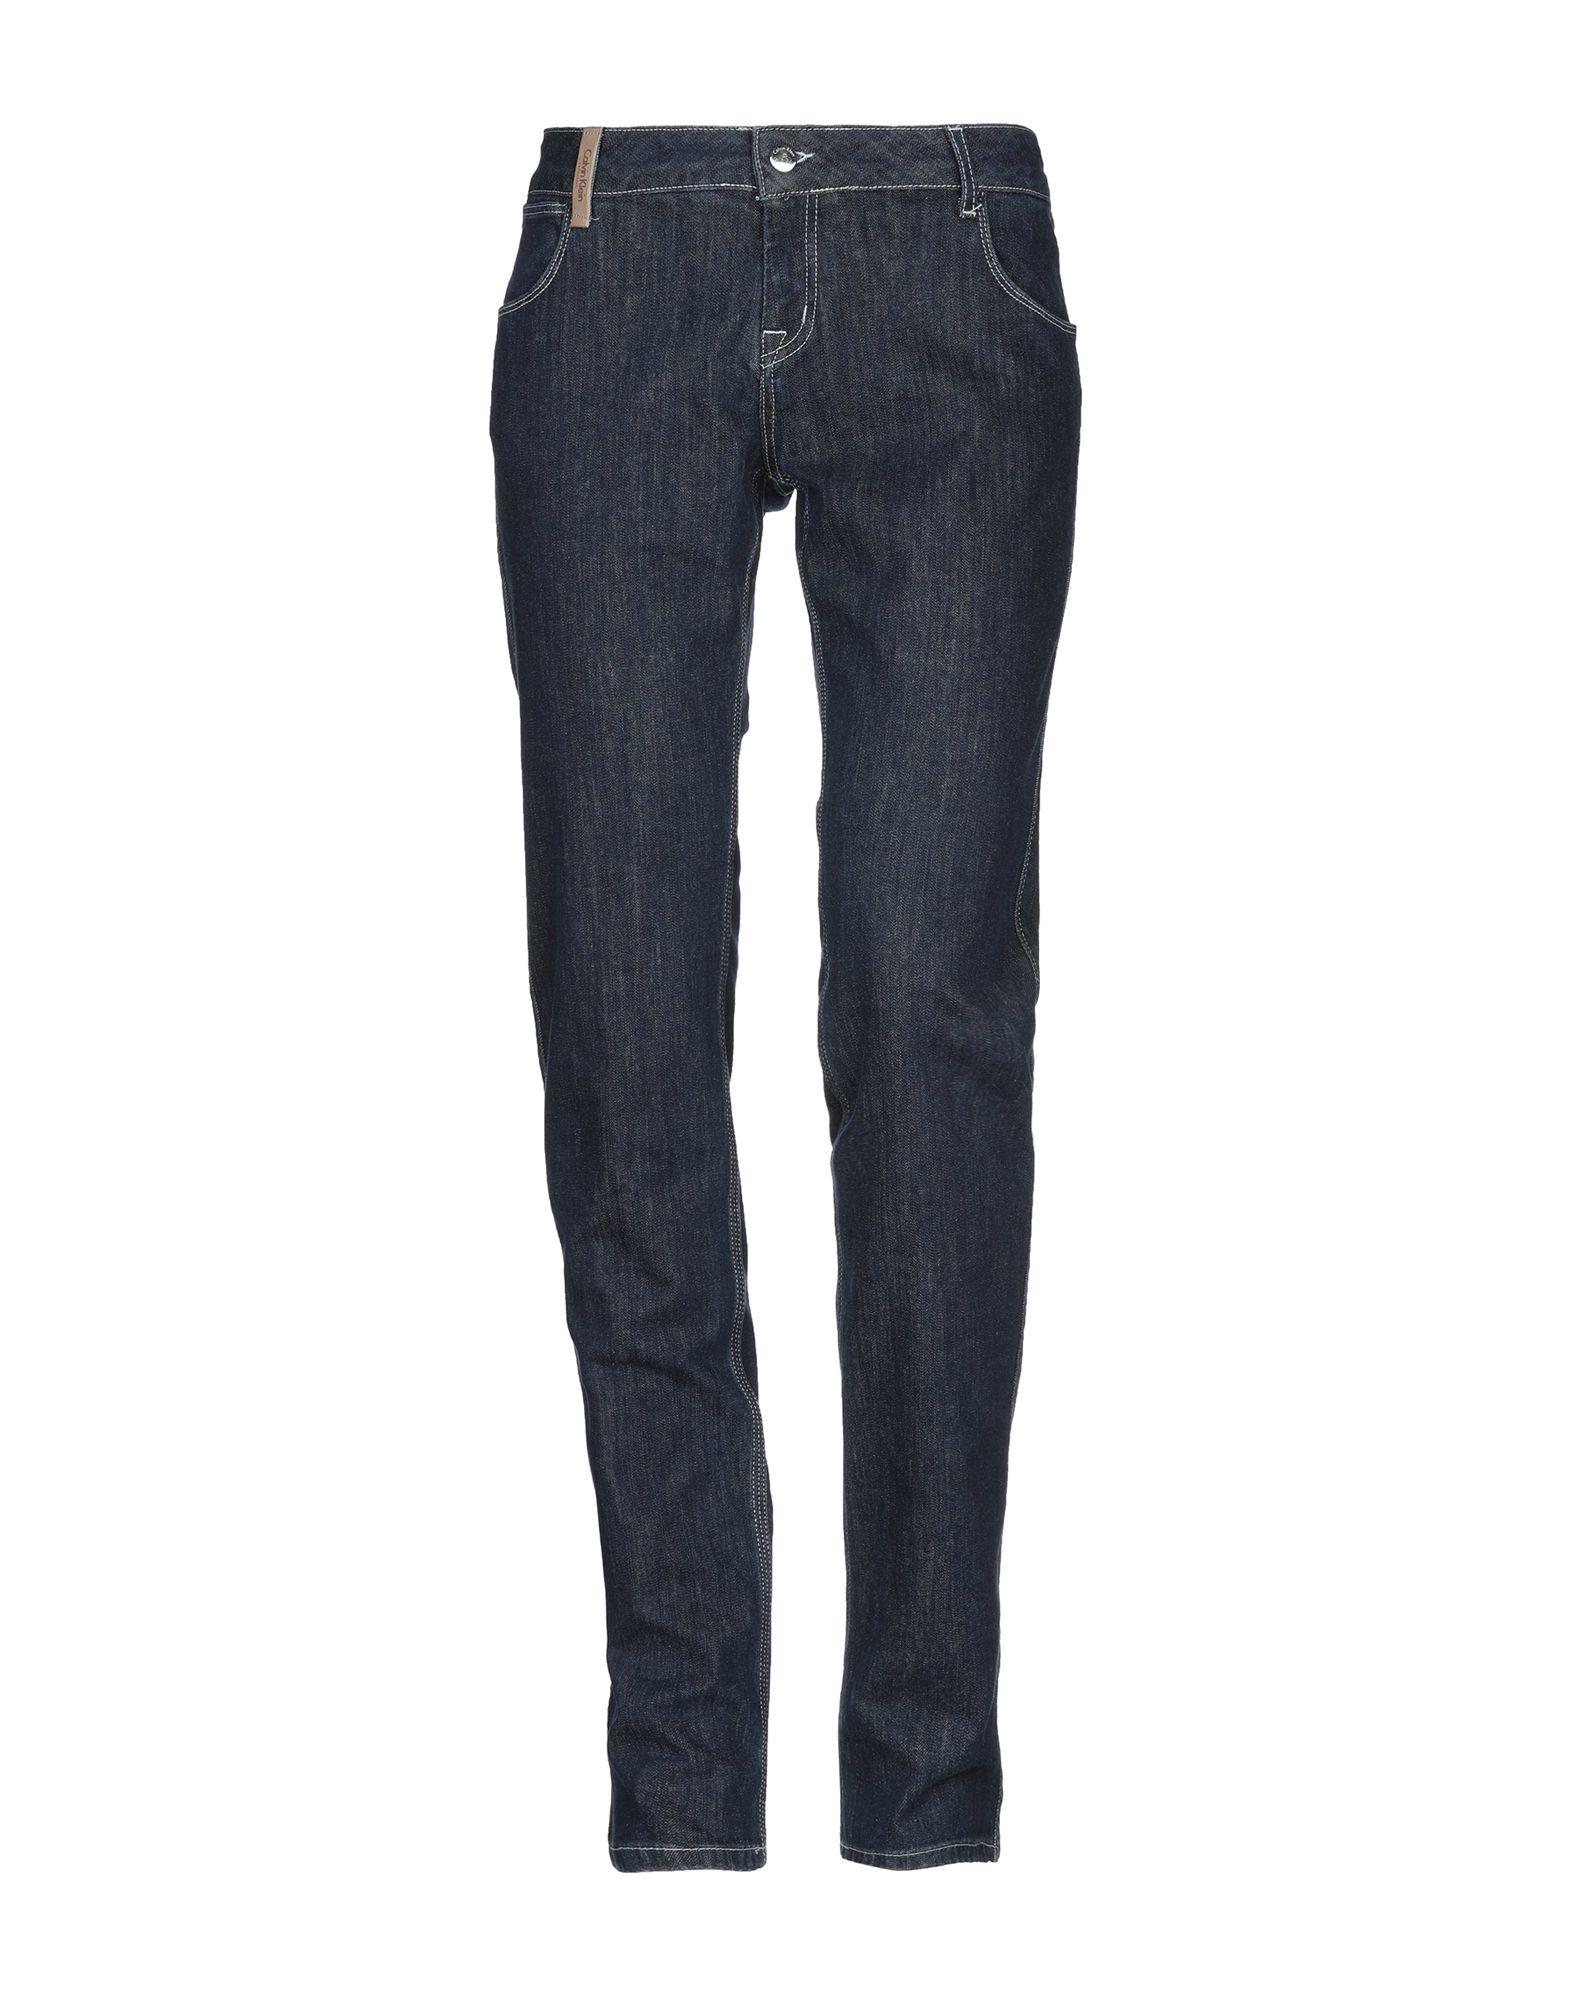 CALVIN KLEIN COLLECTION Джинсовые брюки цены онлайн